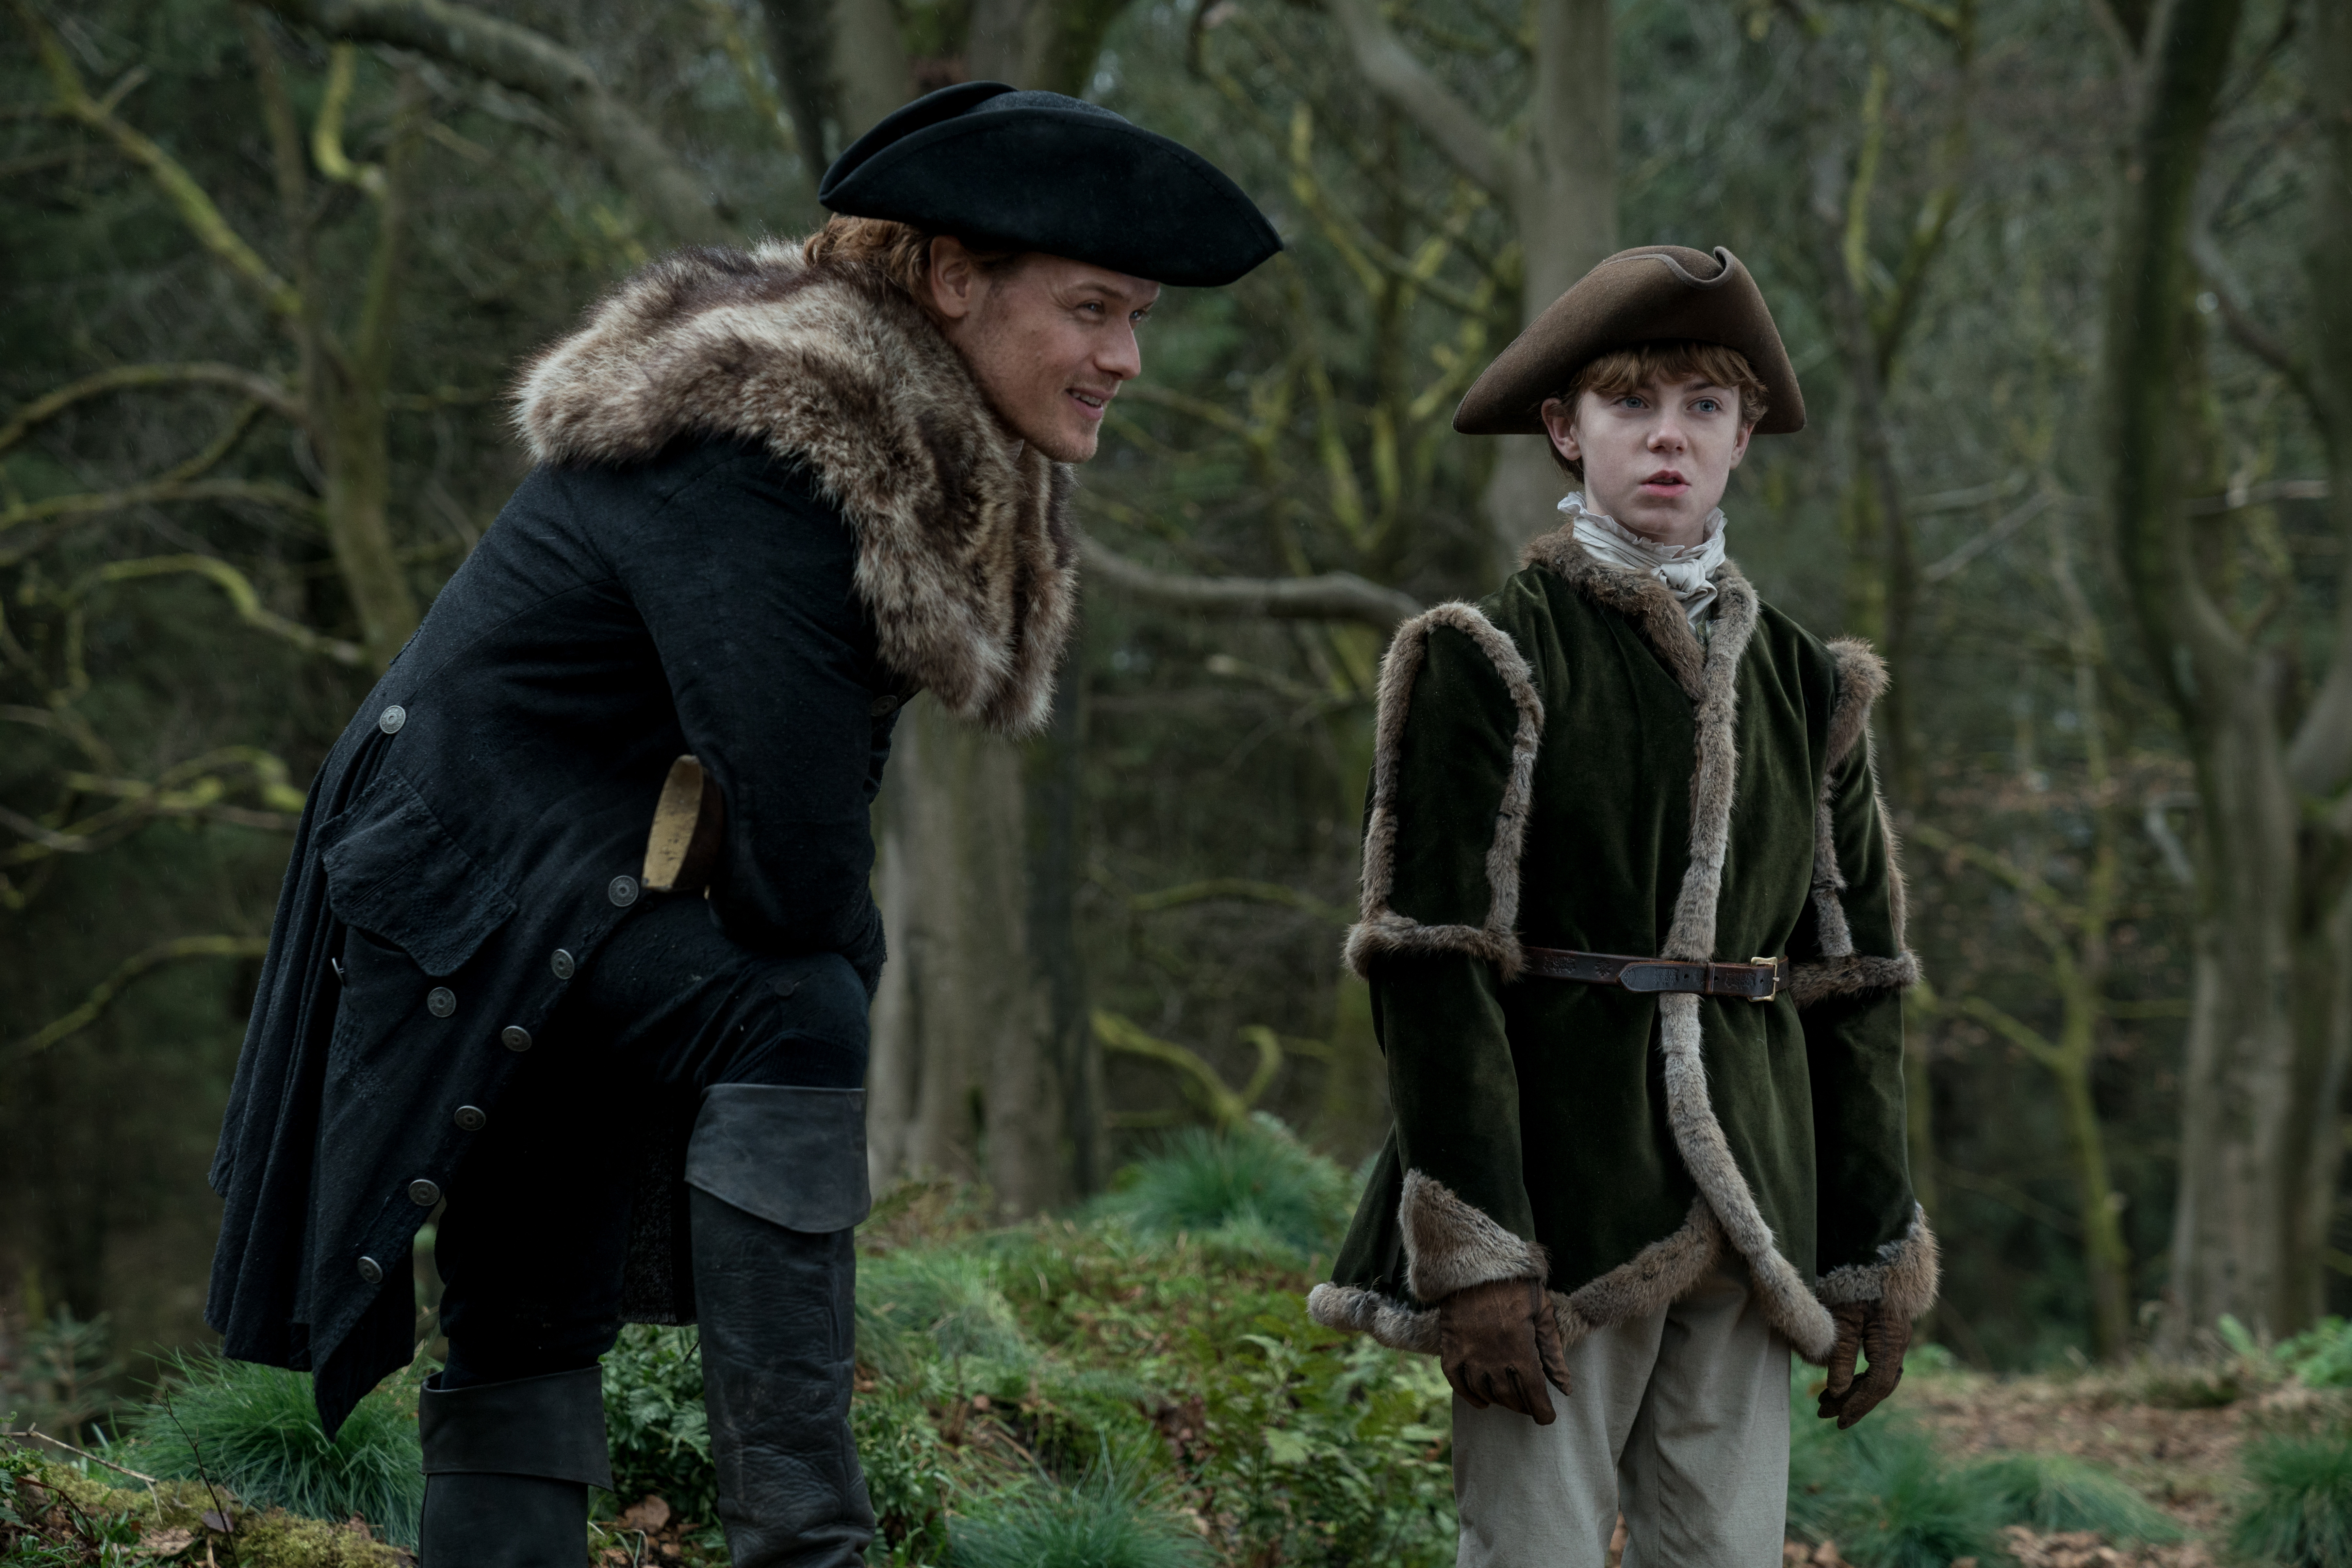 5 best moments from Outlander Season 4, Episode 6